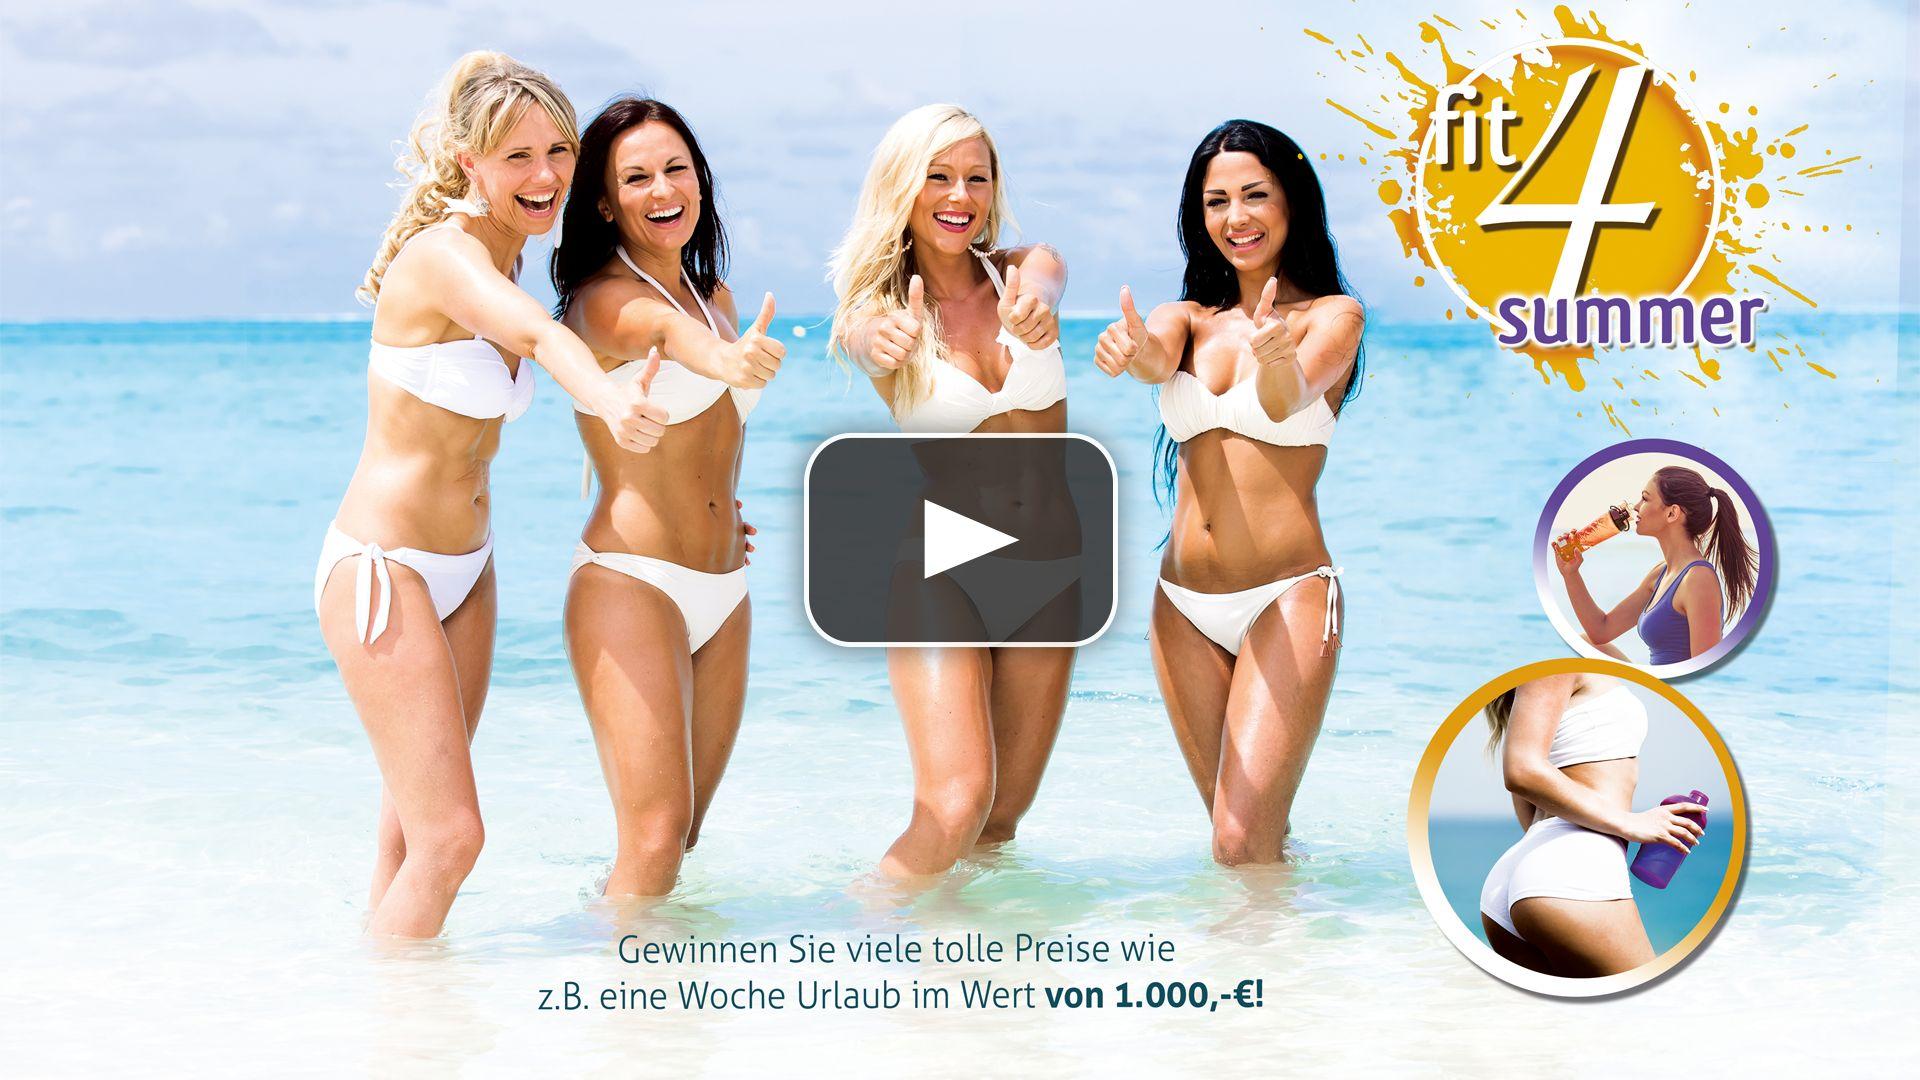 FIVE_Sommerkampagne_2019_Werbe-Video_Startbild